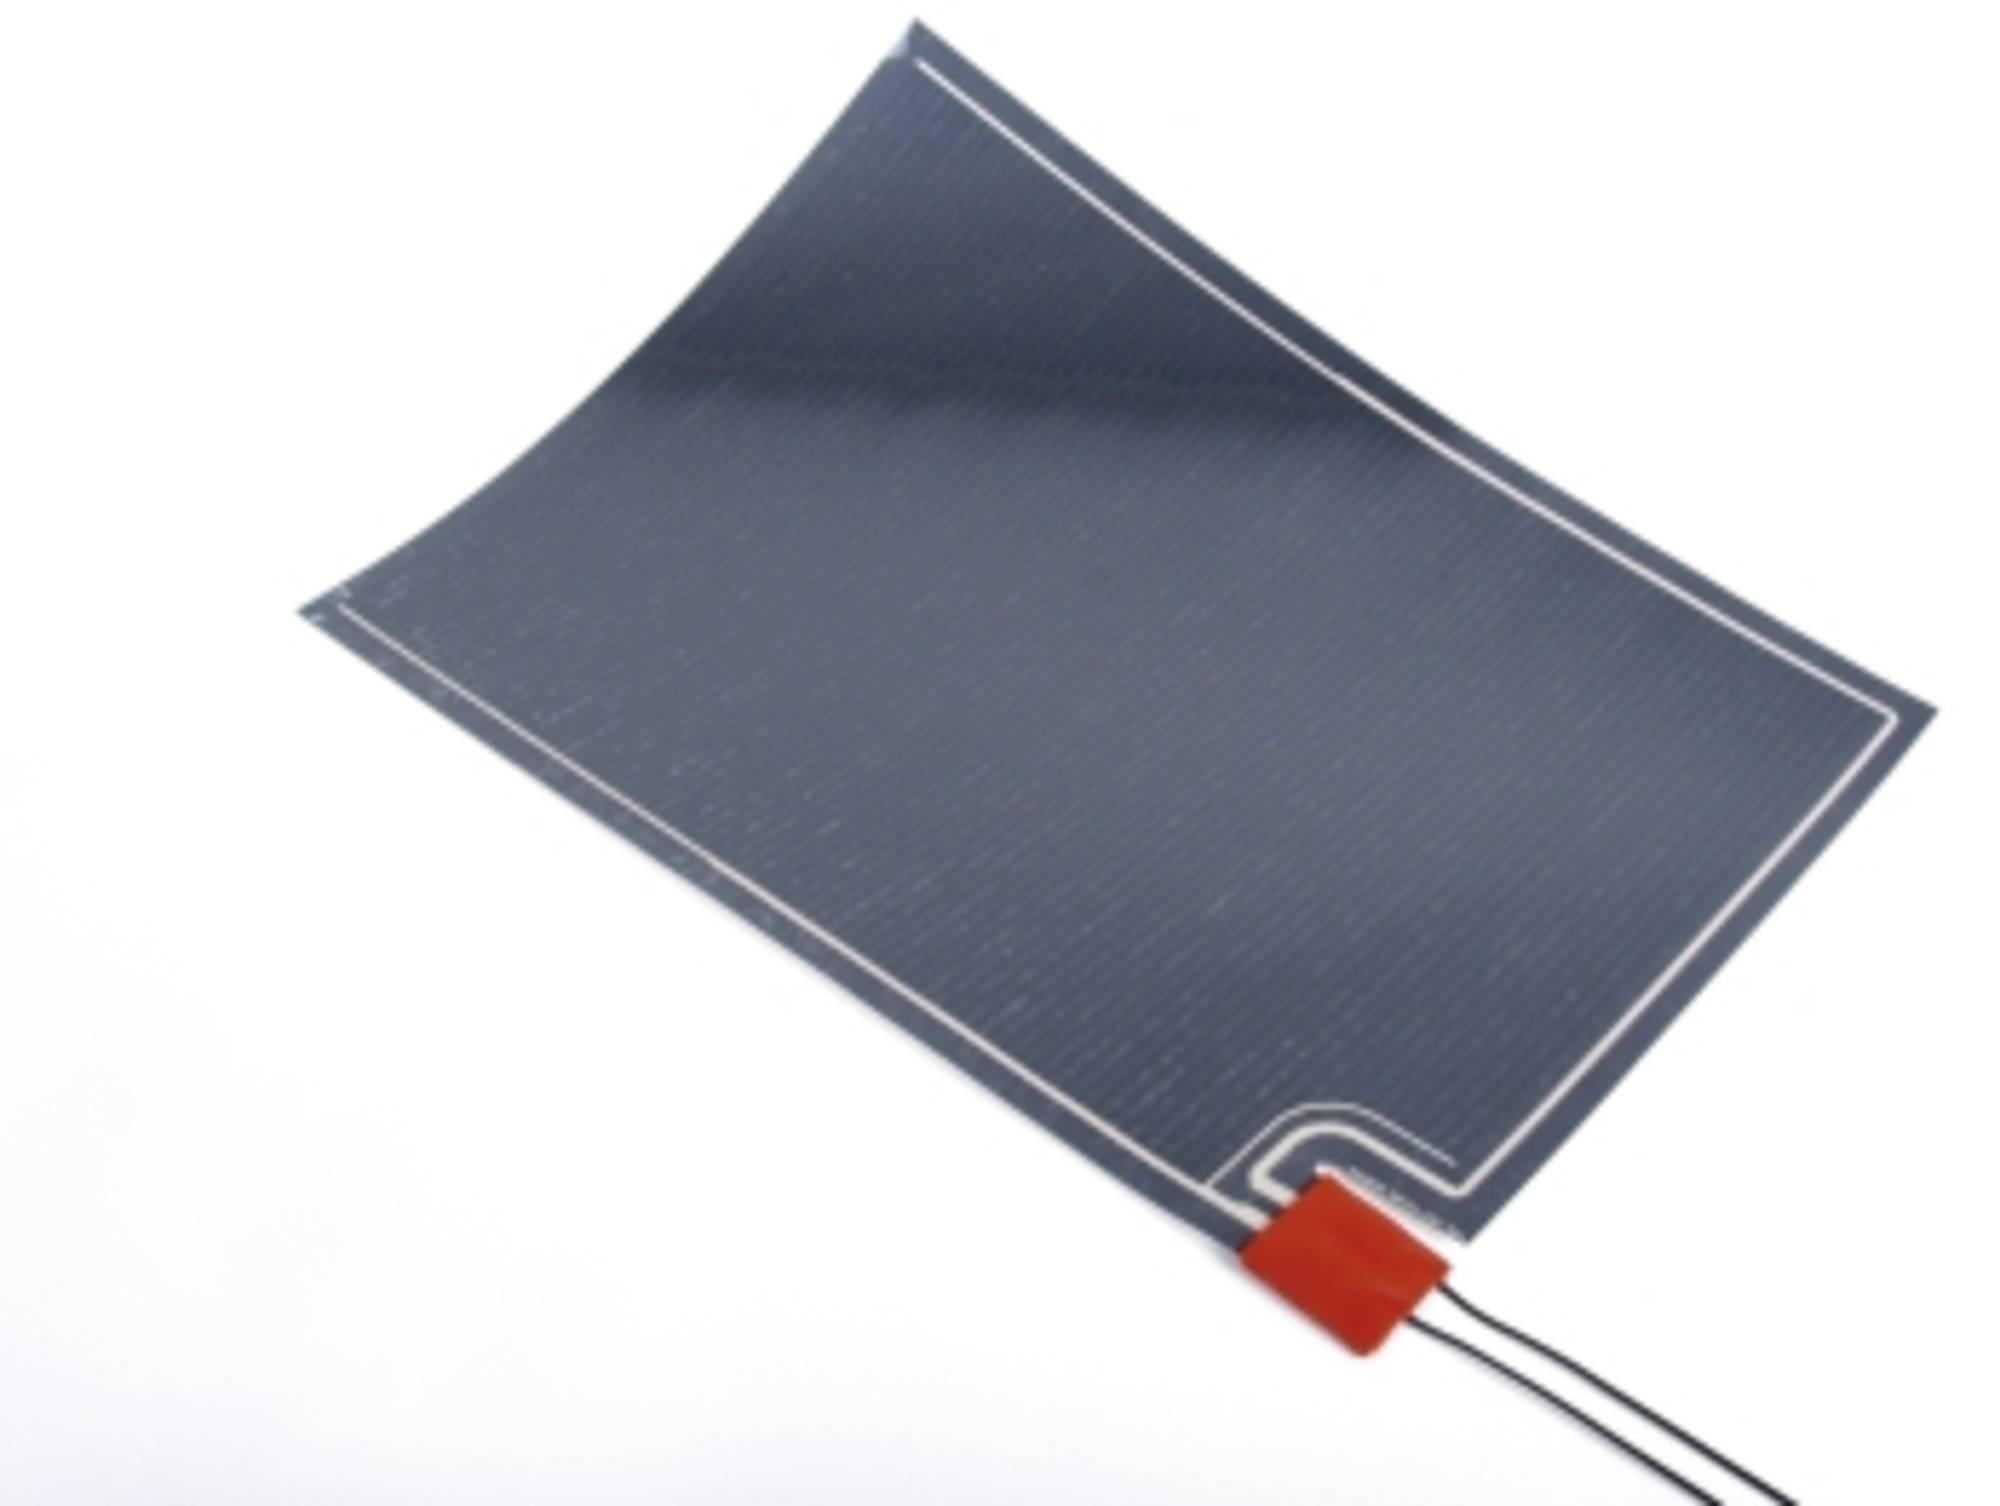 Magnum spiegelverwarmingselement 36x50 cm. 50 watt